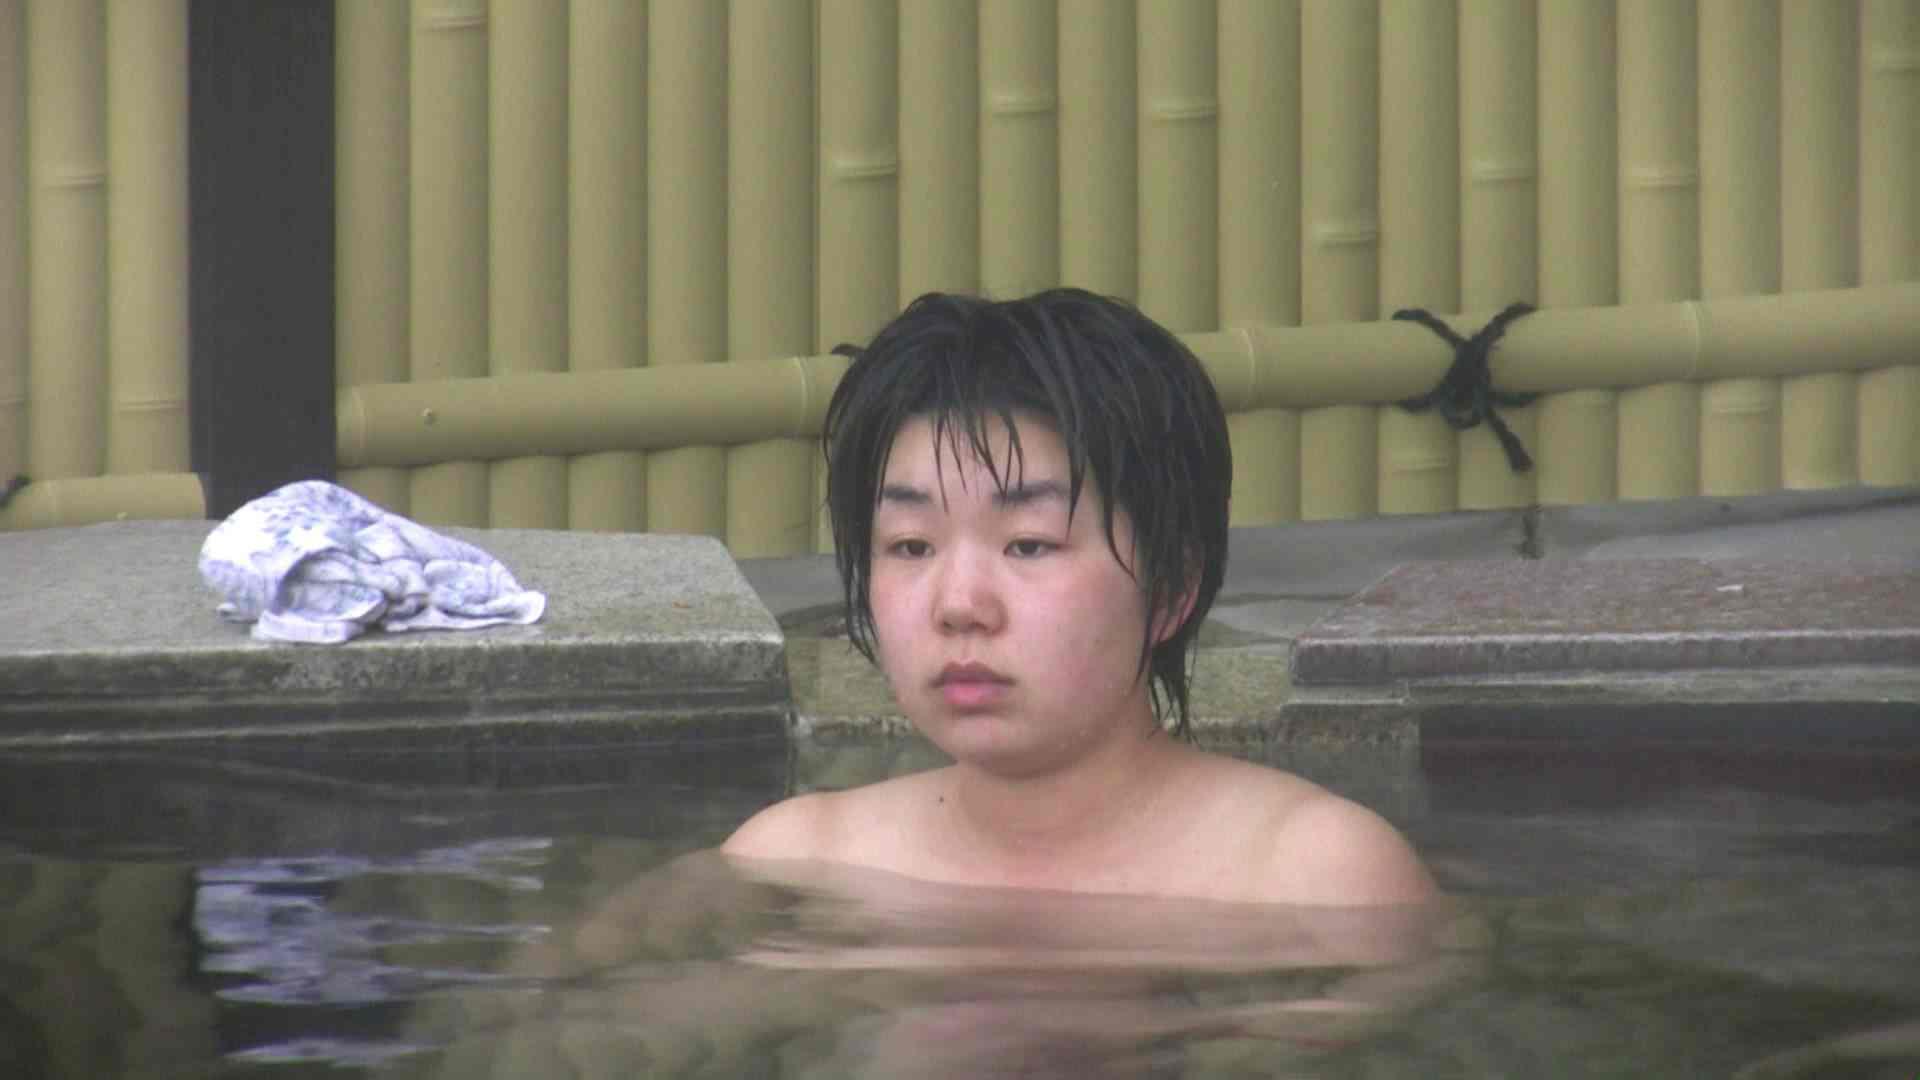 Aquaな露天風呂Vol.53【VIP限定】 露天 盗撮ヌード画像 93連発 14